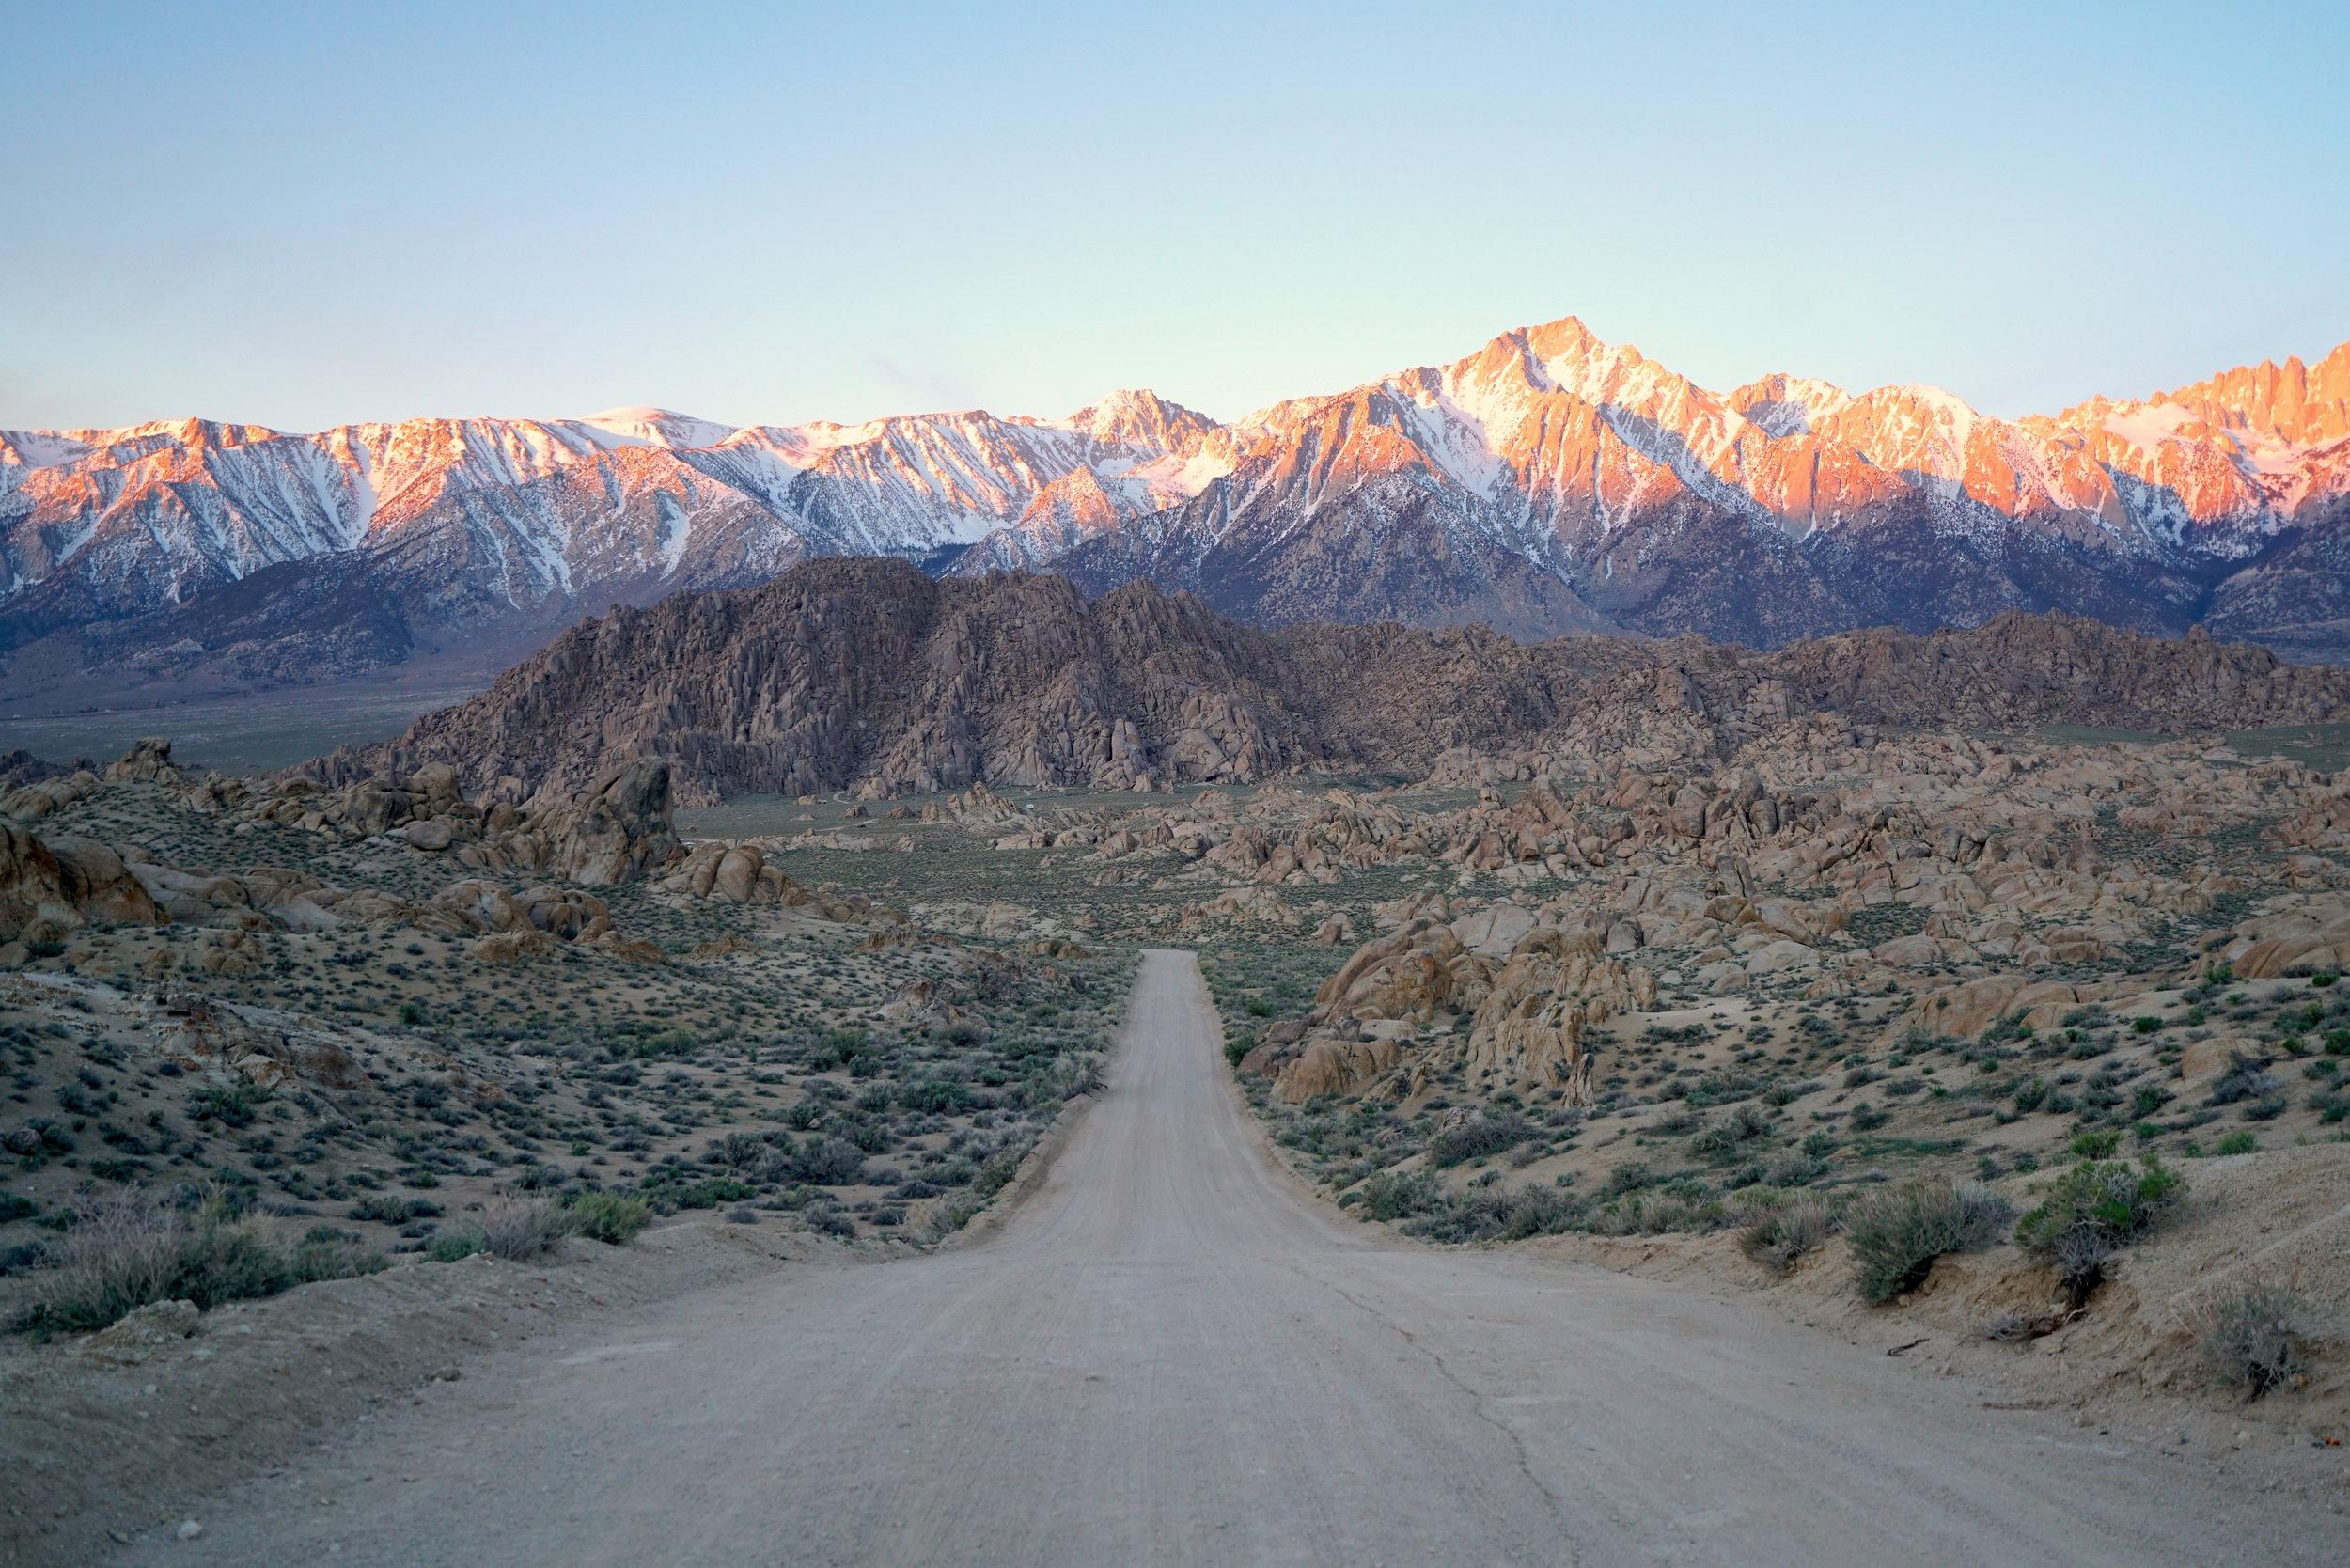 Eastern Sierra & Highway 395 Road Trip - California's Most Scenic Drive